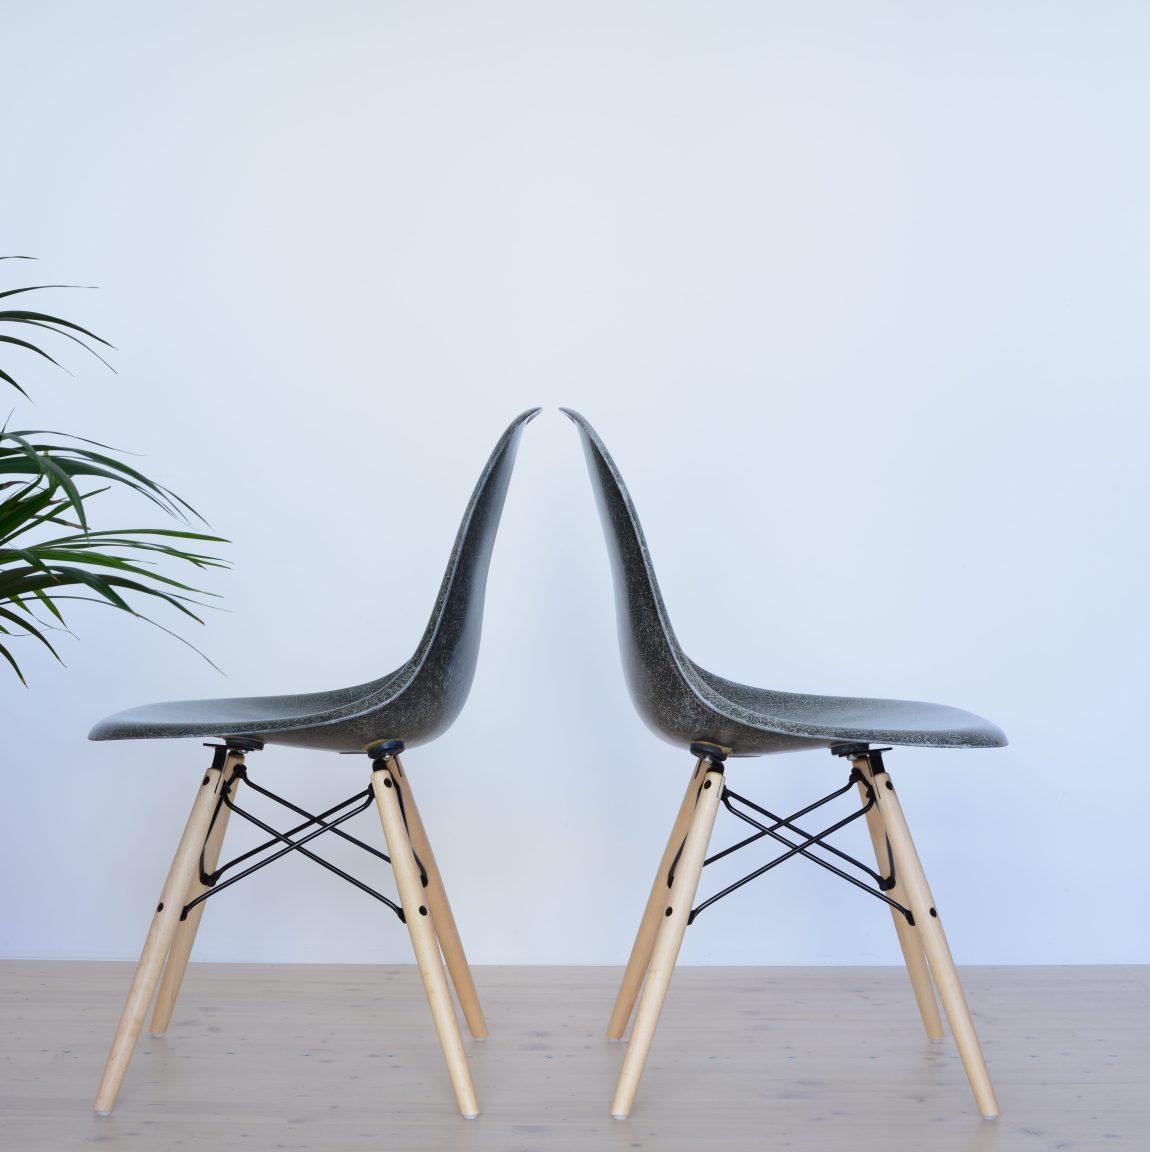 Eames Elephant Grey Fiberglass Dining Chair Pair heyday moebel Zurich